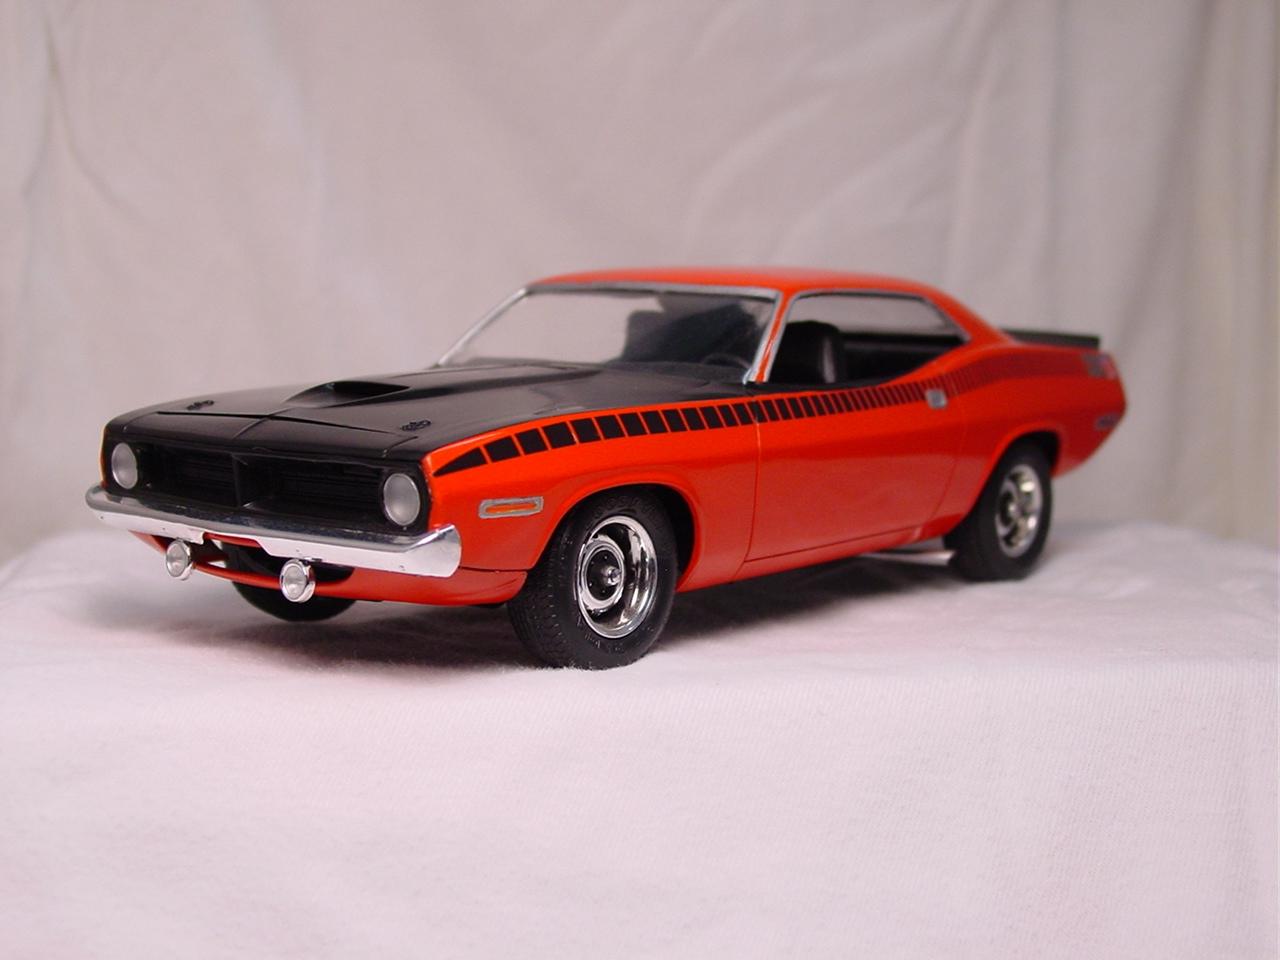 1970 Plymouth AAR Cuda - Revell | Scale importnut.net